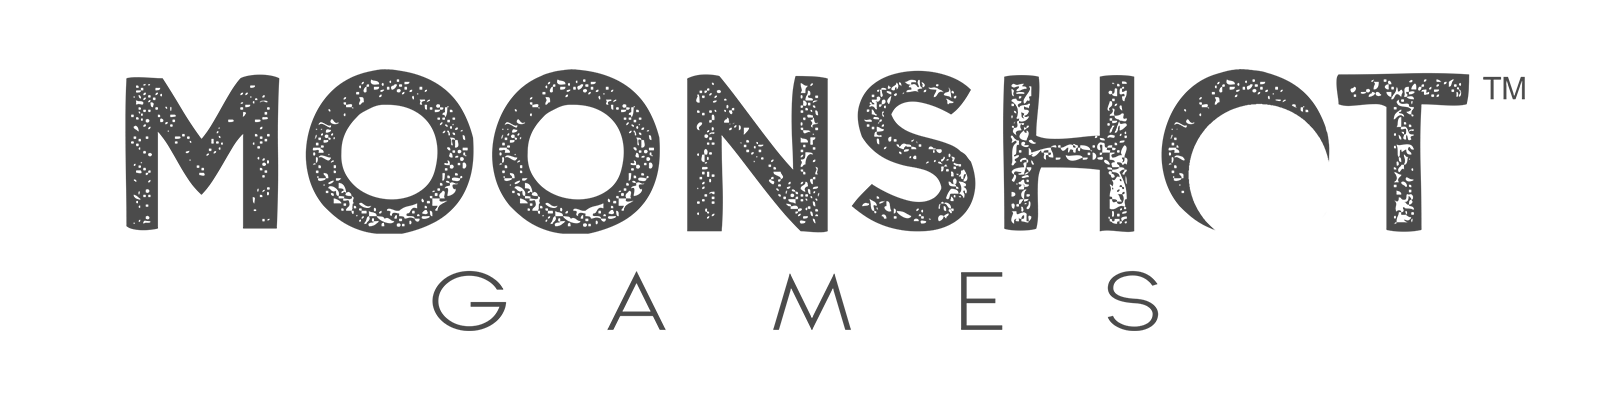 https://global-uploads.webflow.com/5e7465405df65d8590630a90/5f07a1547b93760c85b5c482_moonshot-logo-1600x400.png